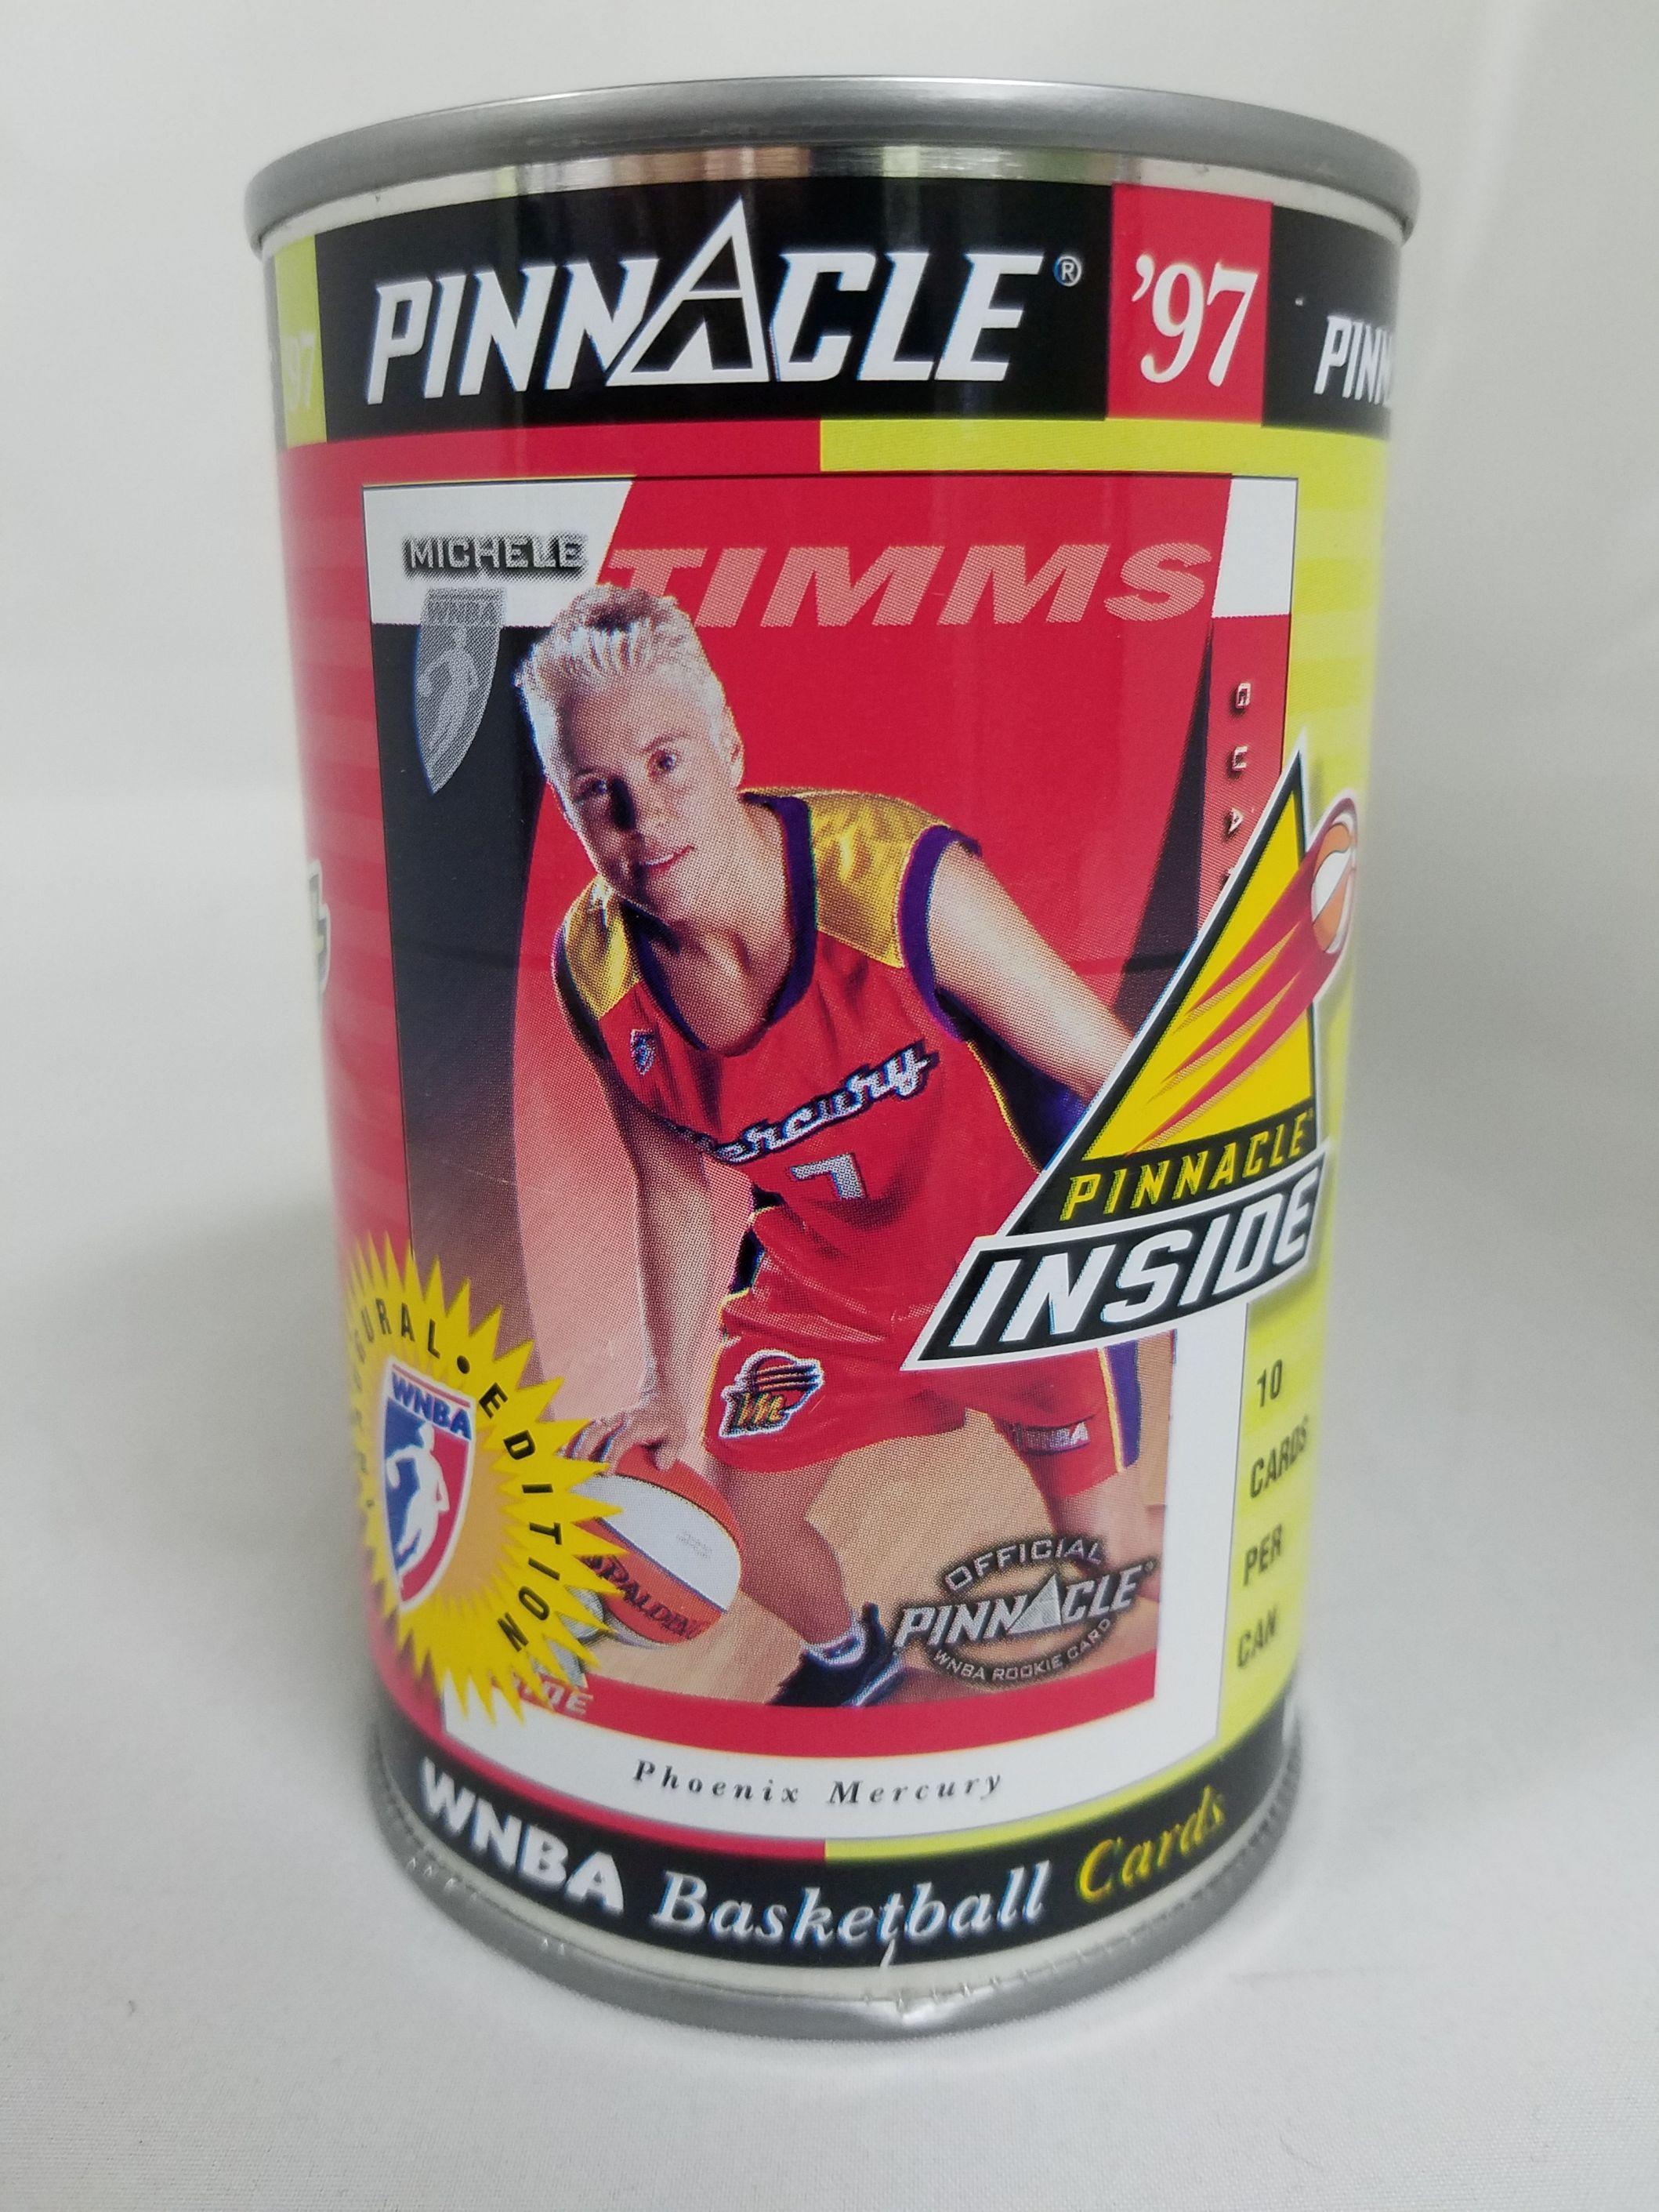 1997 Pinnacle Inside WNBA Cans #11 Michele Timms